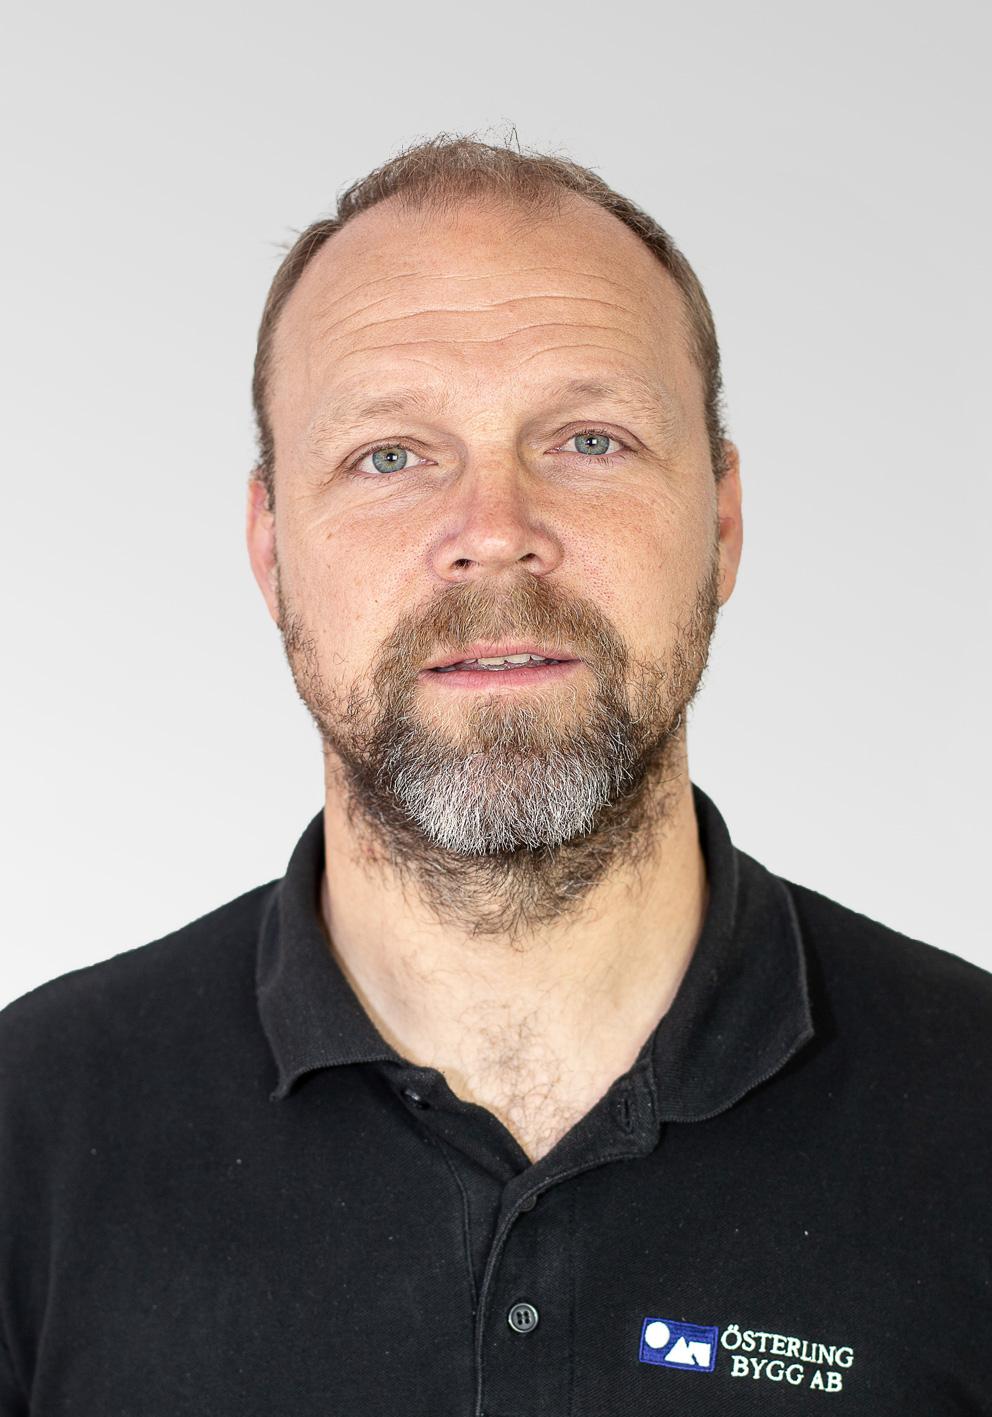 Lars-Erik Johansson